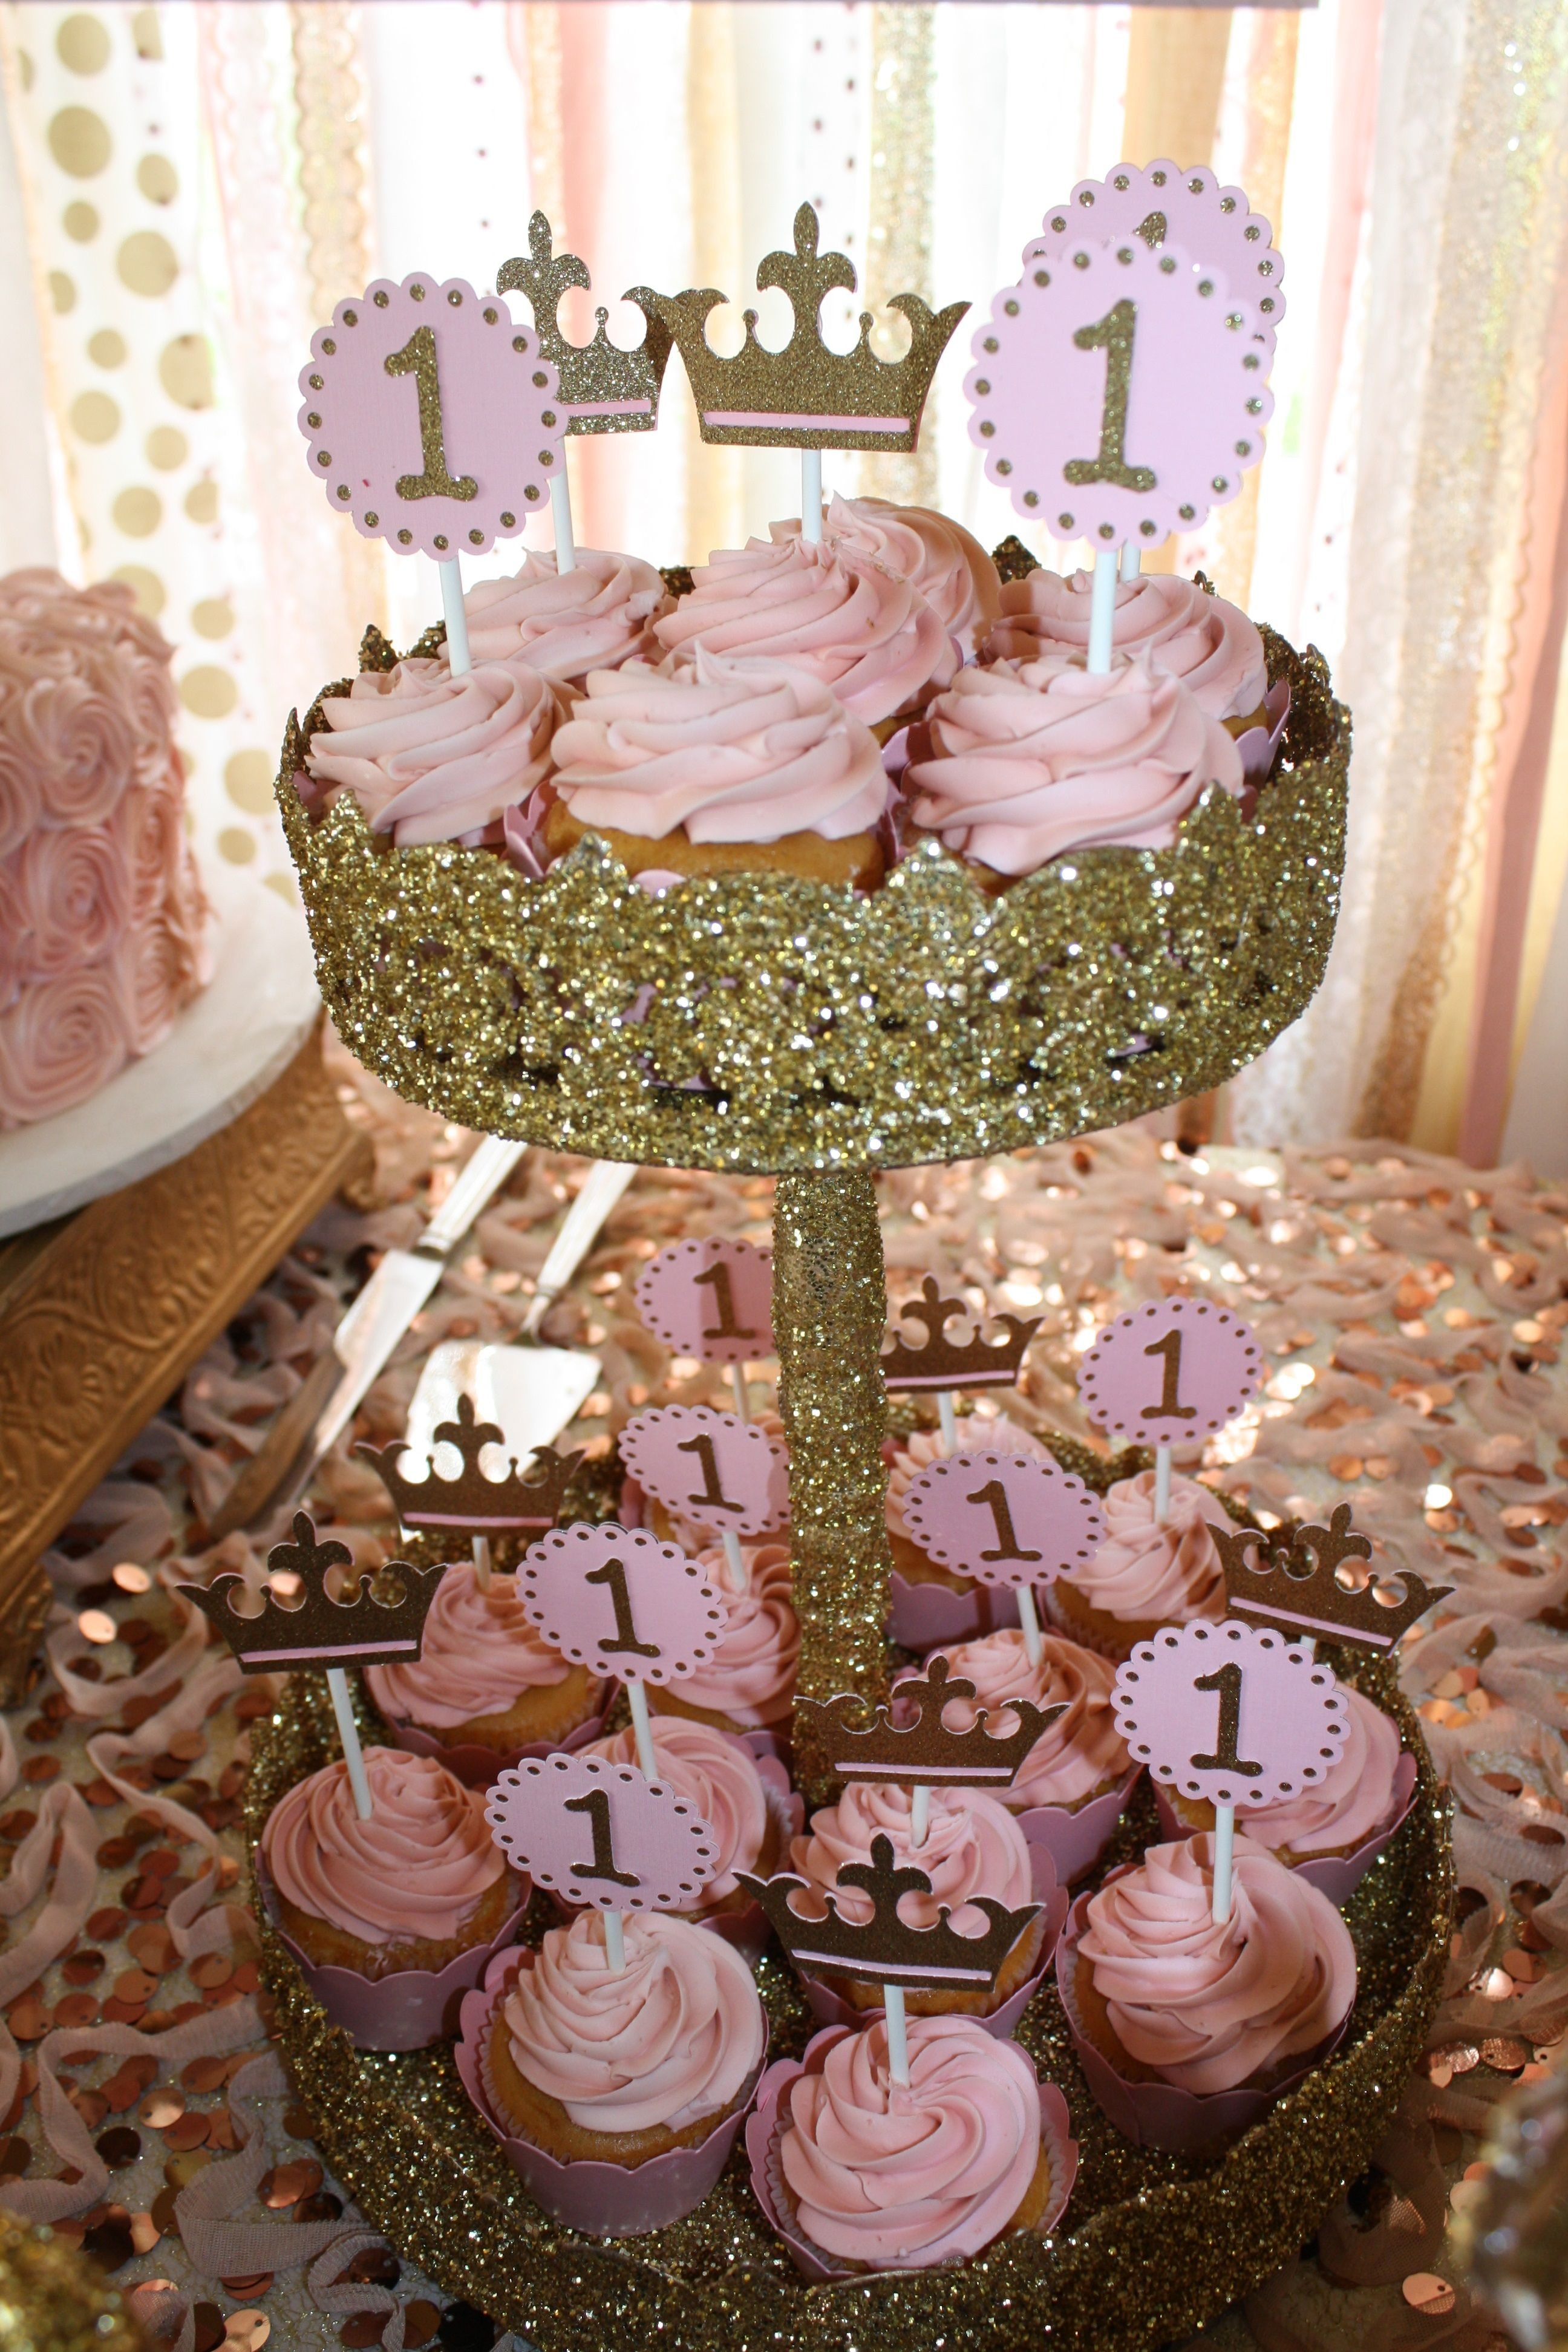 Pink Gold Princess Party Cupcakes By Bake My Day Katy TX